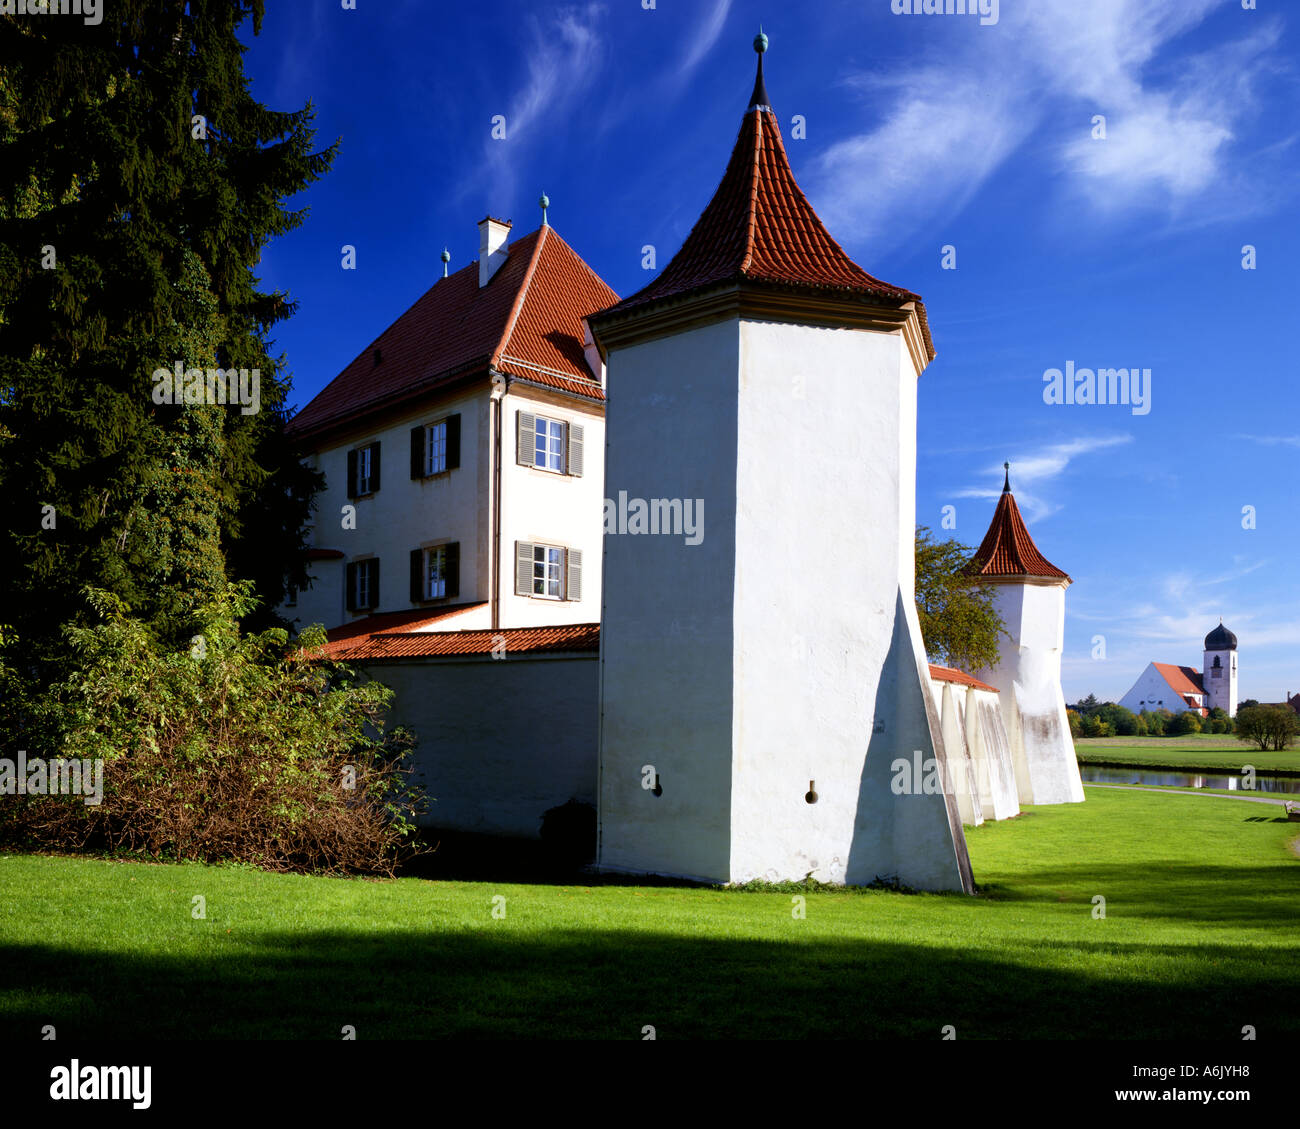 D  BAVARIA:  Blutenburg Castle at Munich - Stock Image